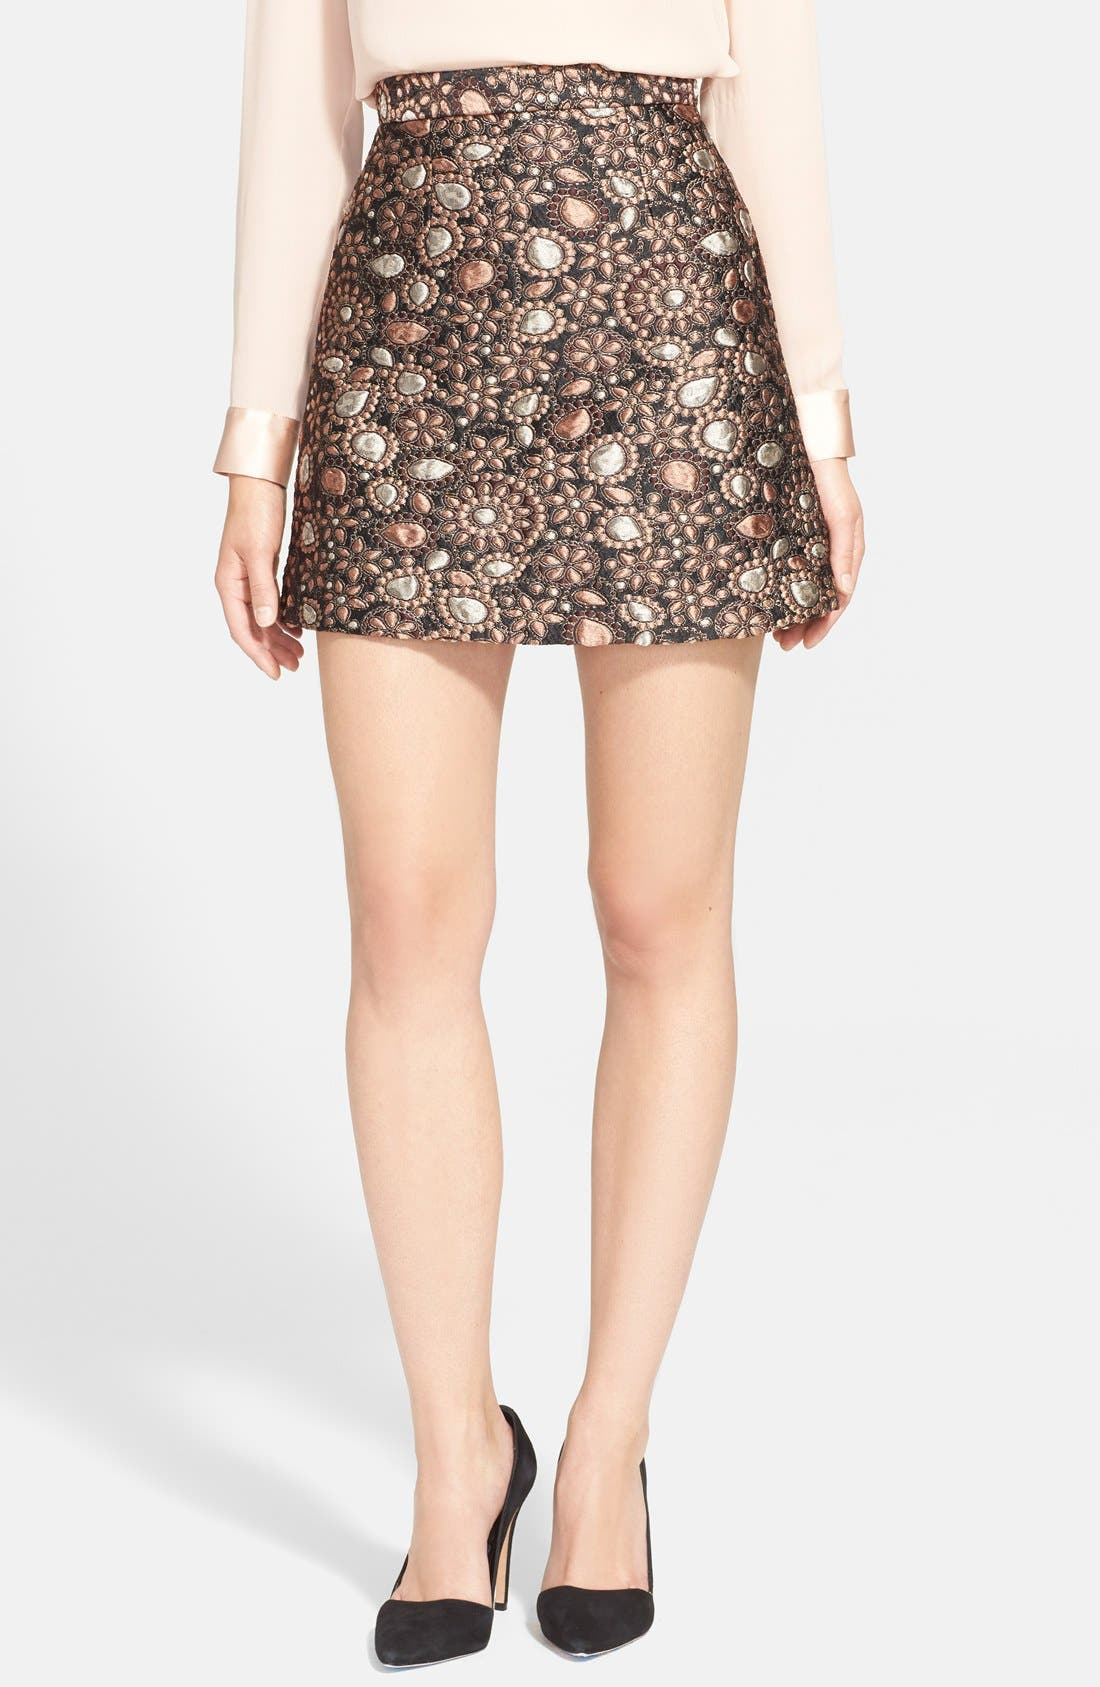 ALICE + OLIVIA 'Jessa' A-Line Skirt, Main, color, 716